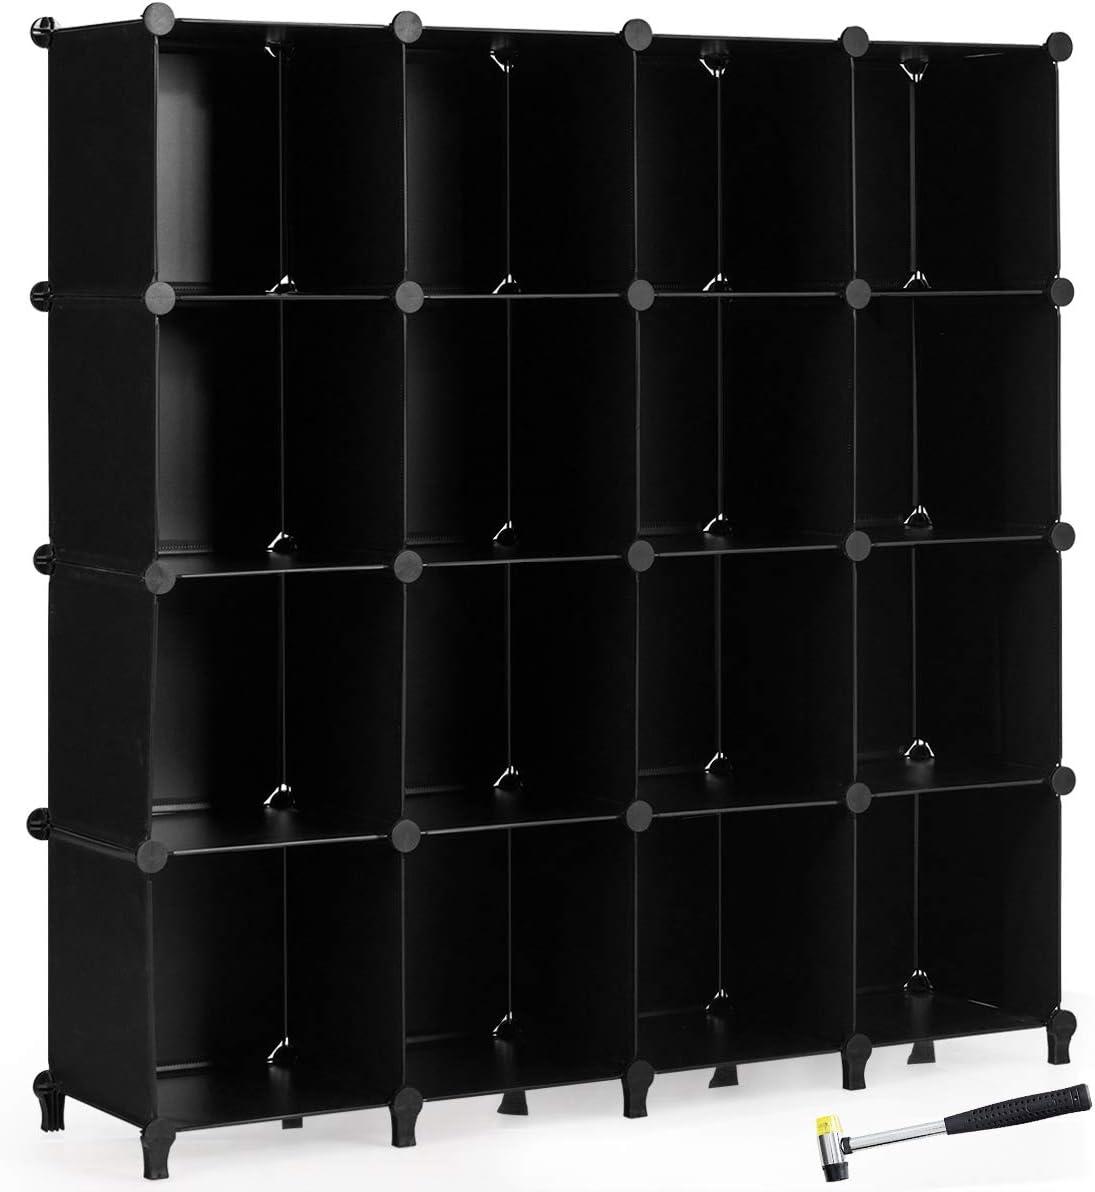 Tangkula 16 Cubes Storage Organizer trust Closet Plastic Cabin Our shop most popular PP DIY